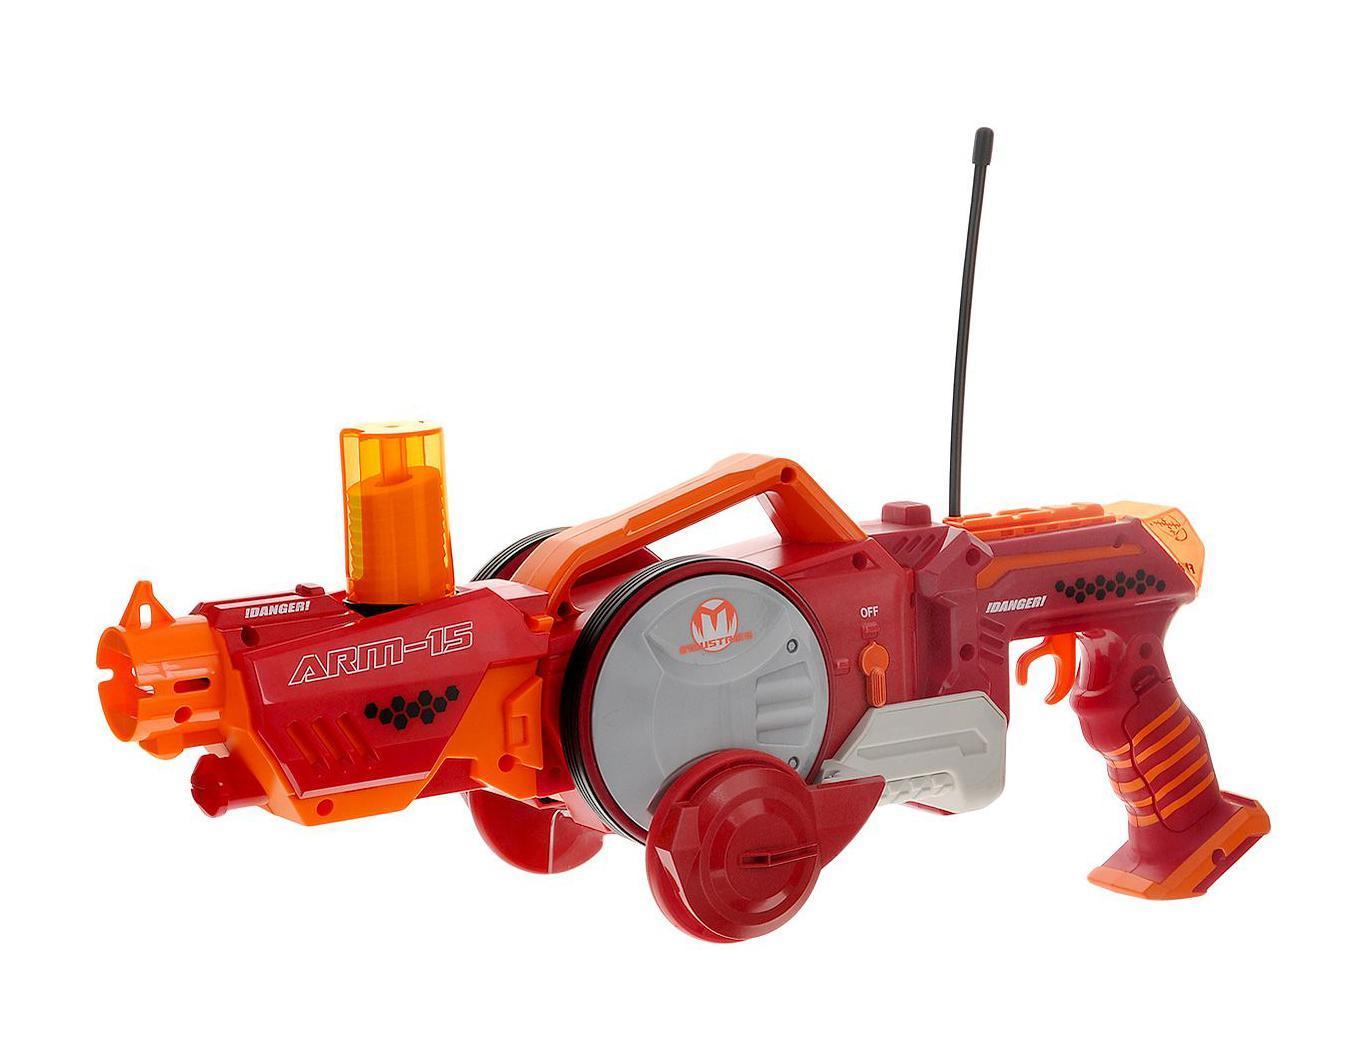 Maisto Игрушка-трансформер на радиоуправлении Armered Attack